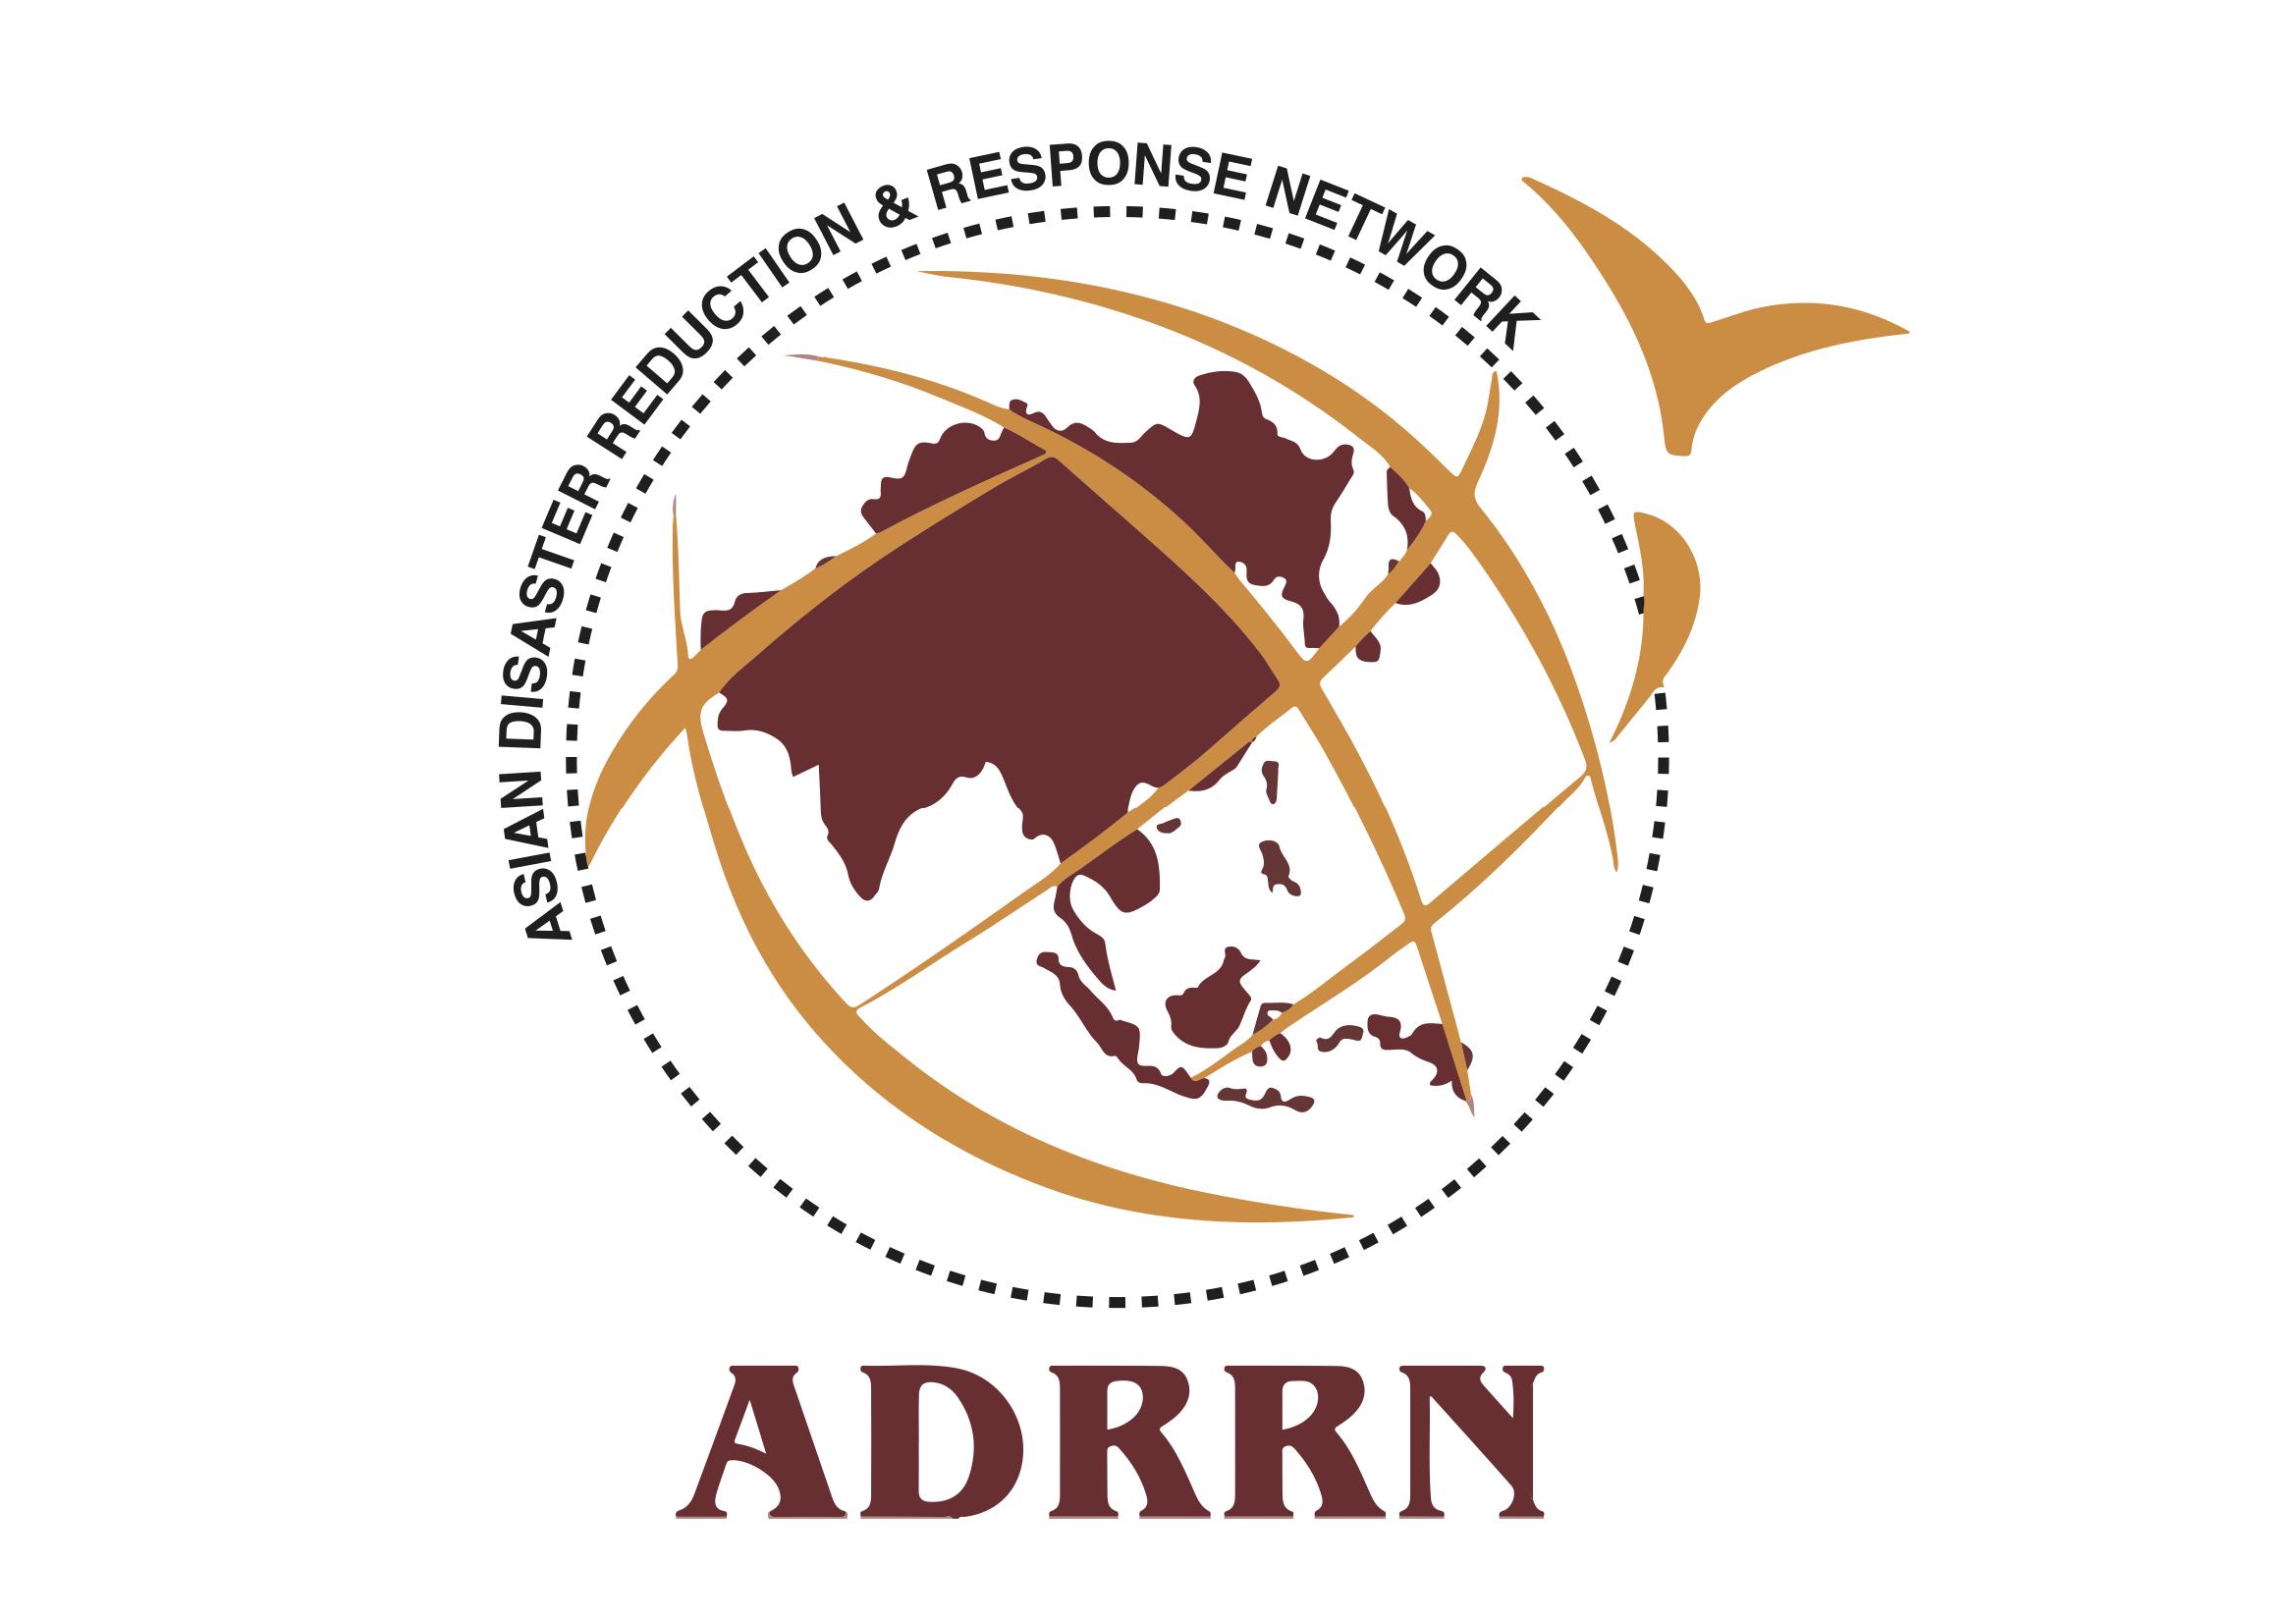 (c) Adrrn.net